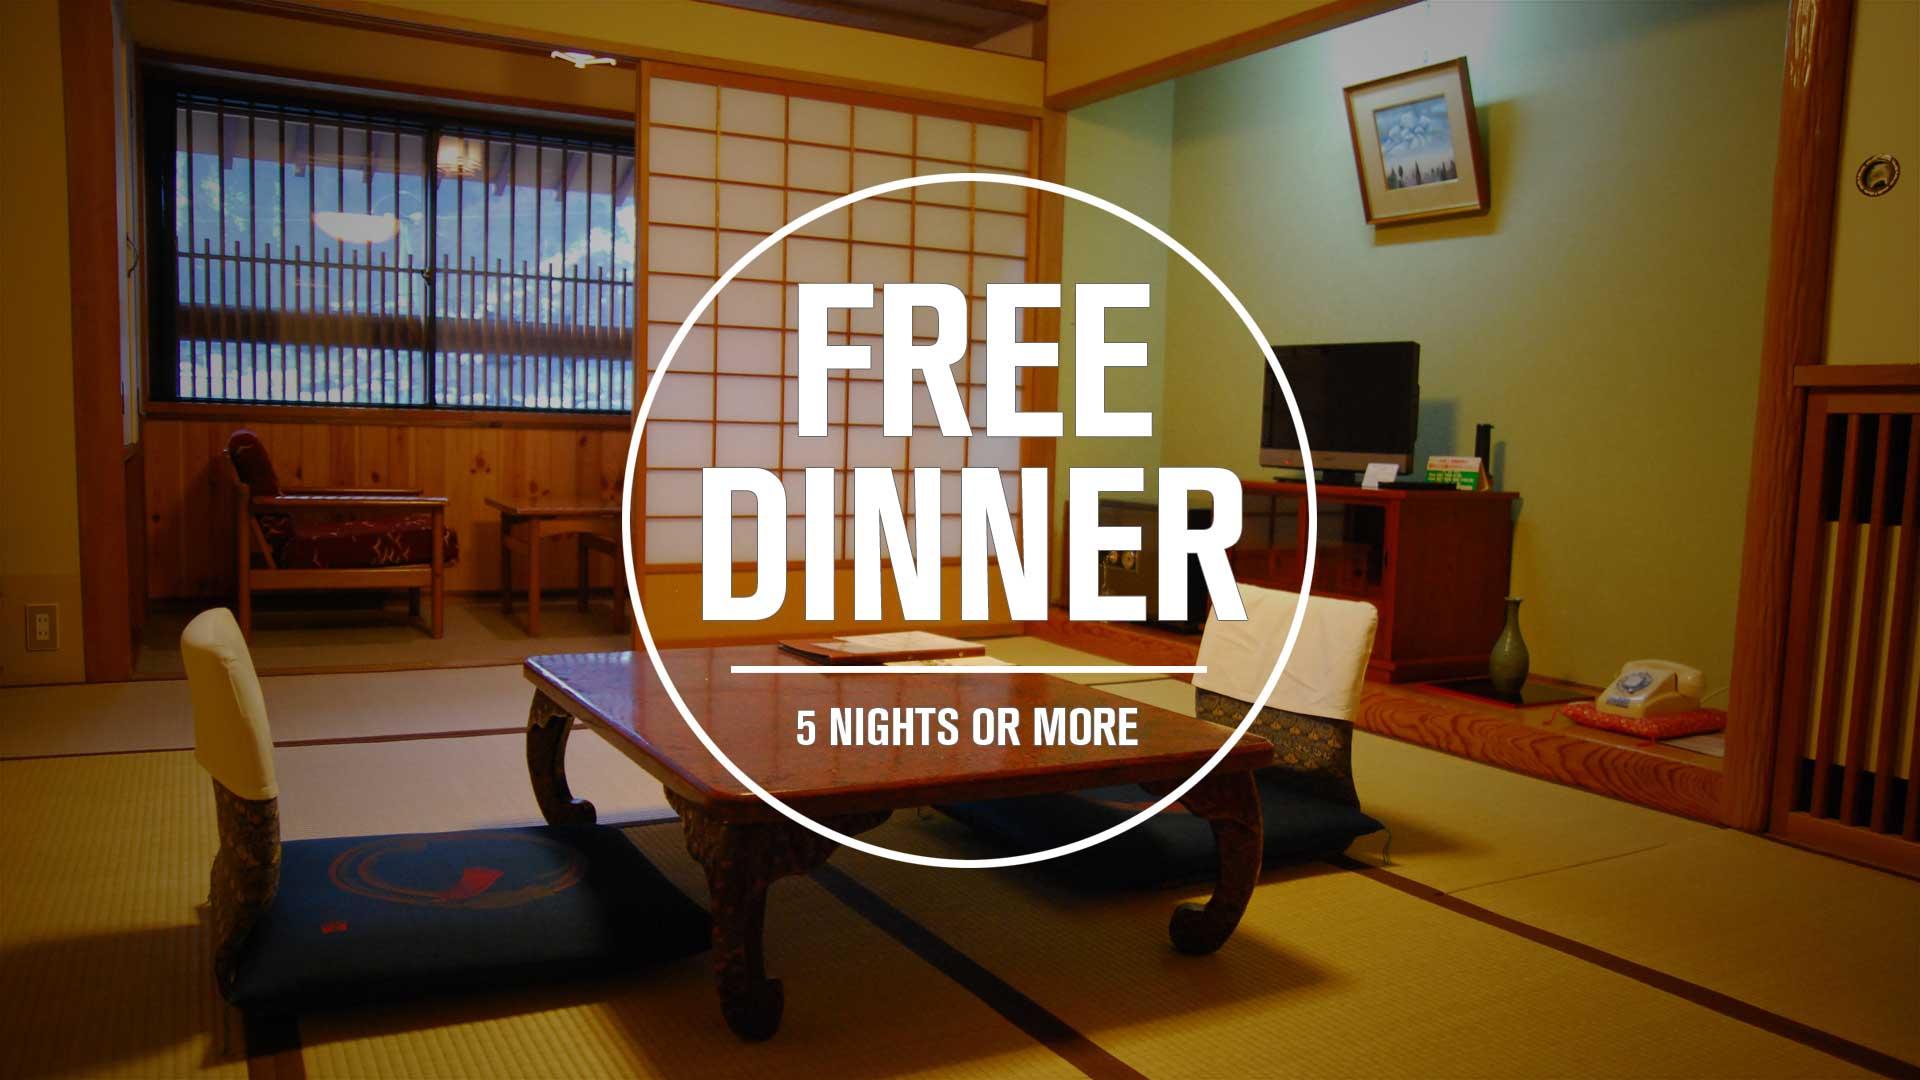 tokiwaya-ryokan-free-dinner-2017-1920x1080